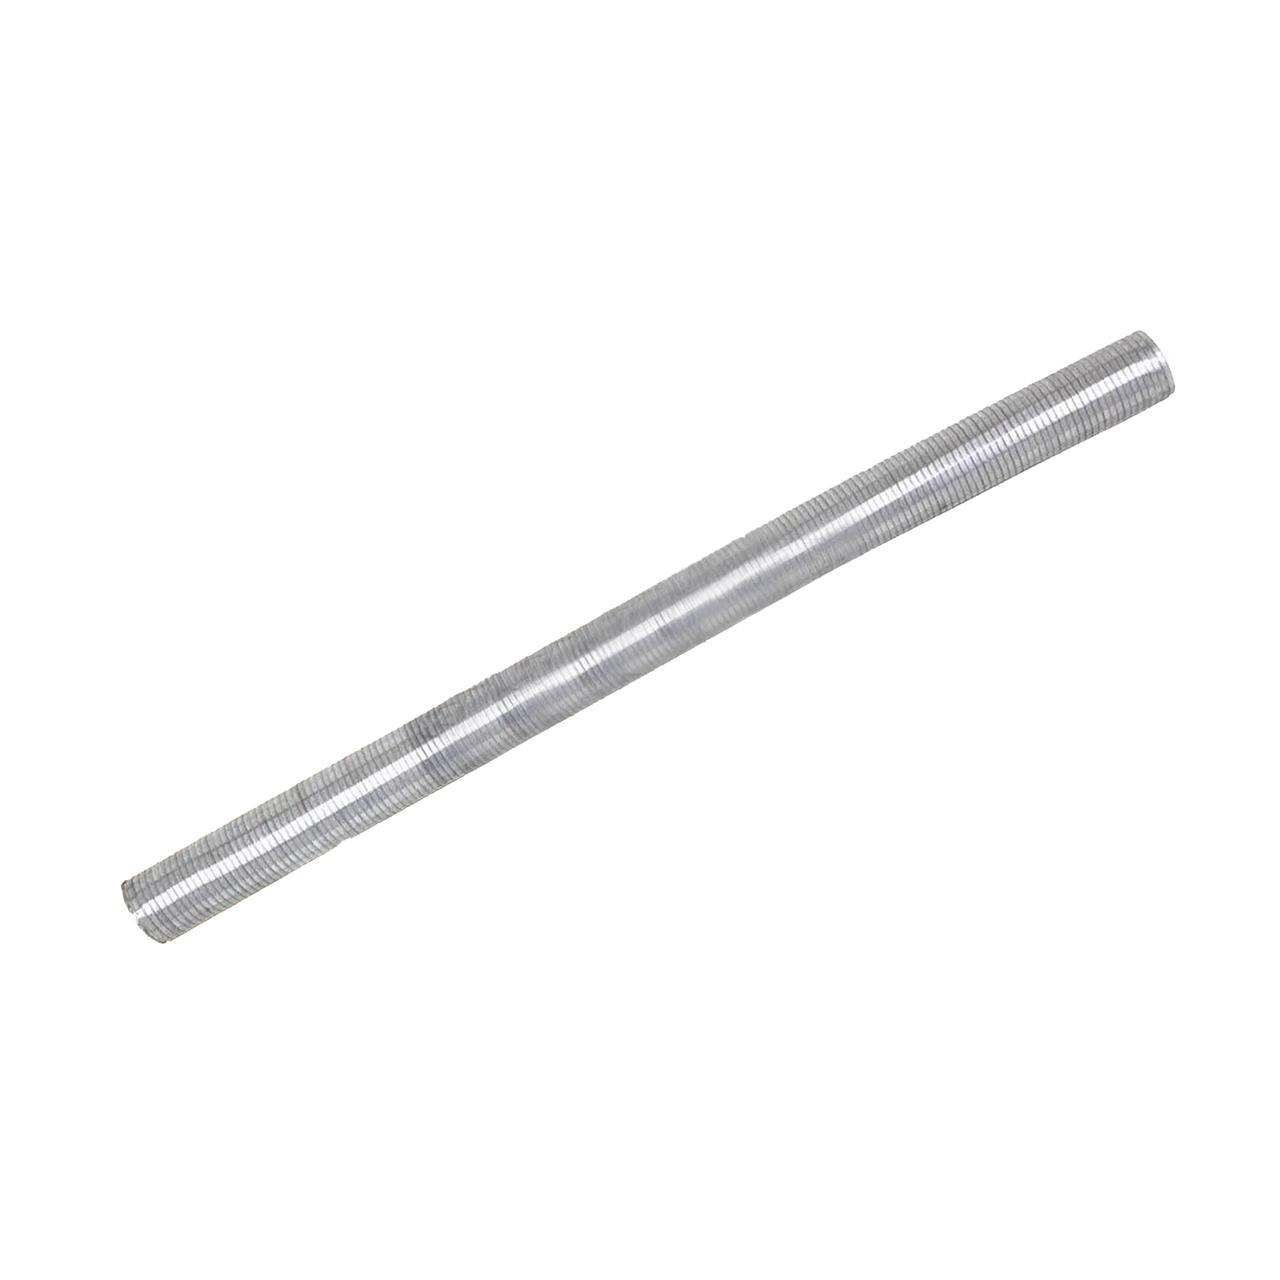 Гофрированная труба оцинкованная сталь 120 мм 1,5м без фланцев